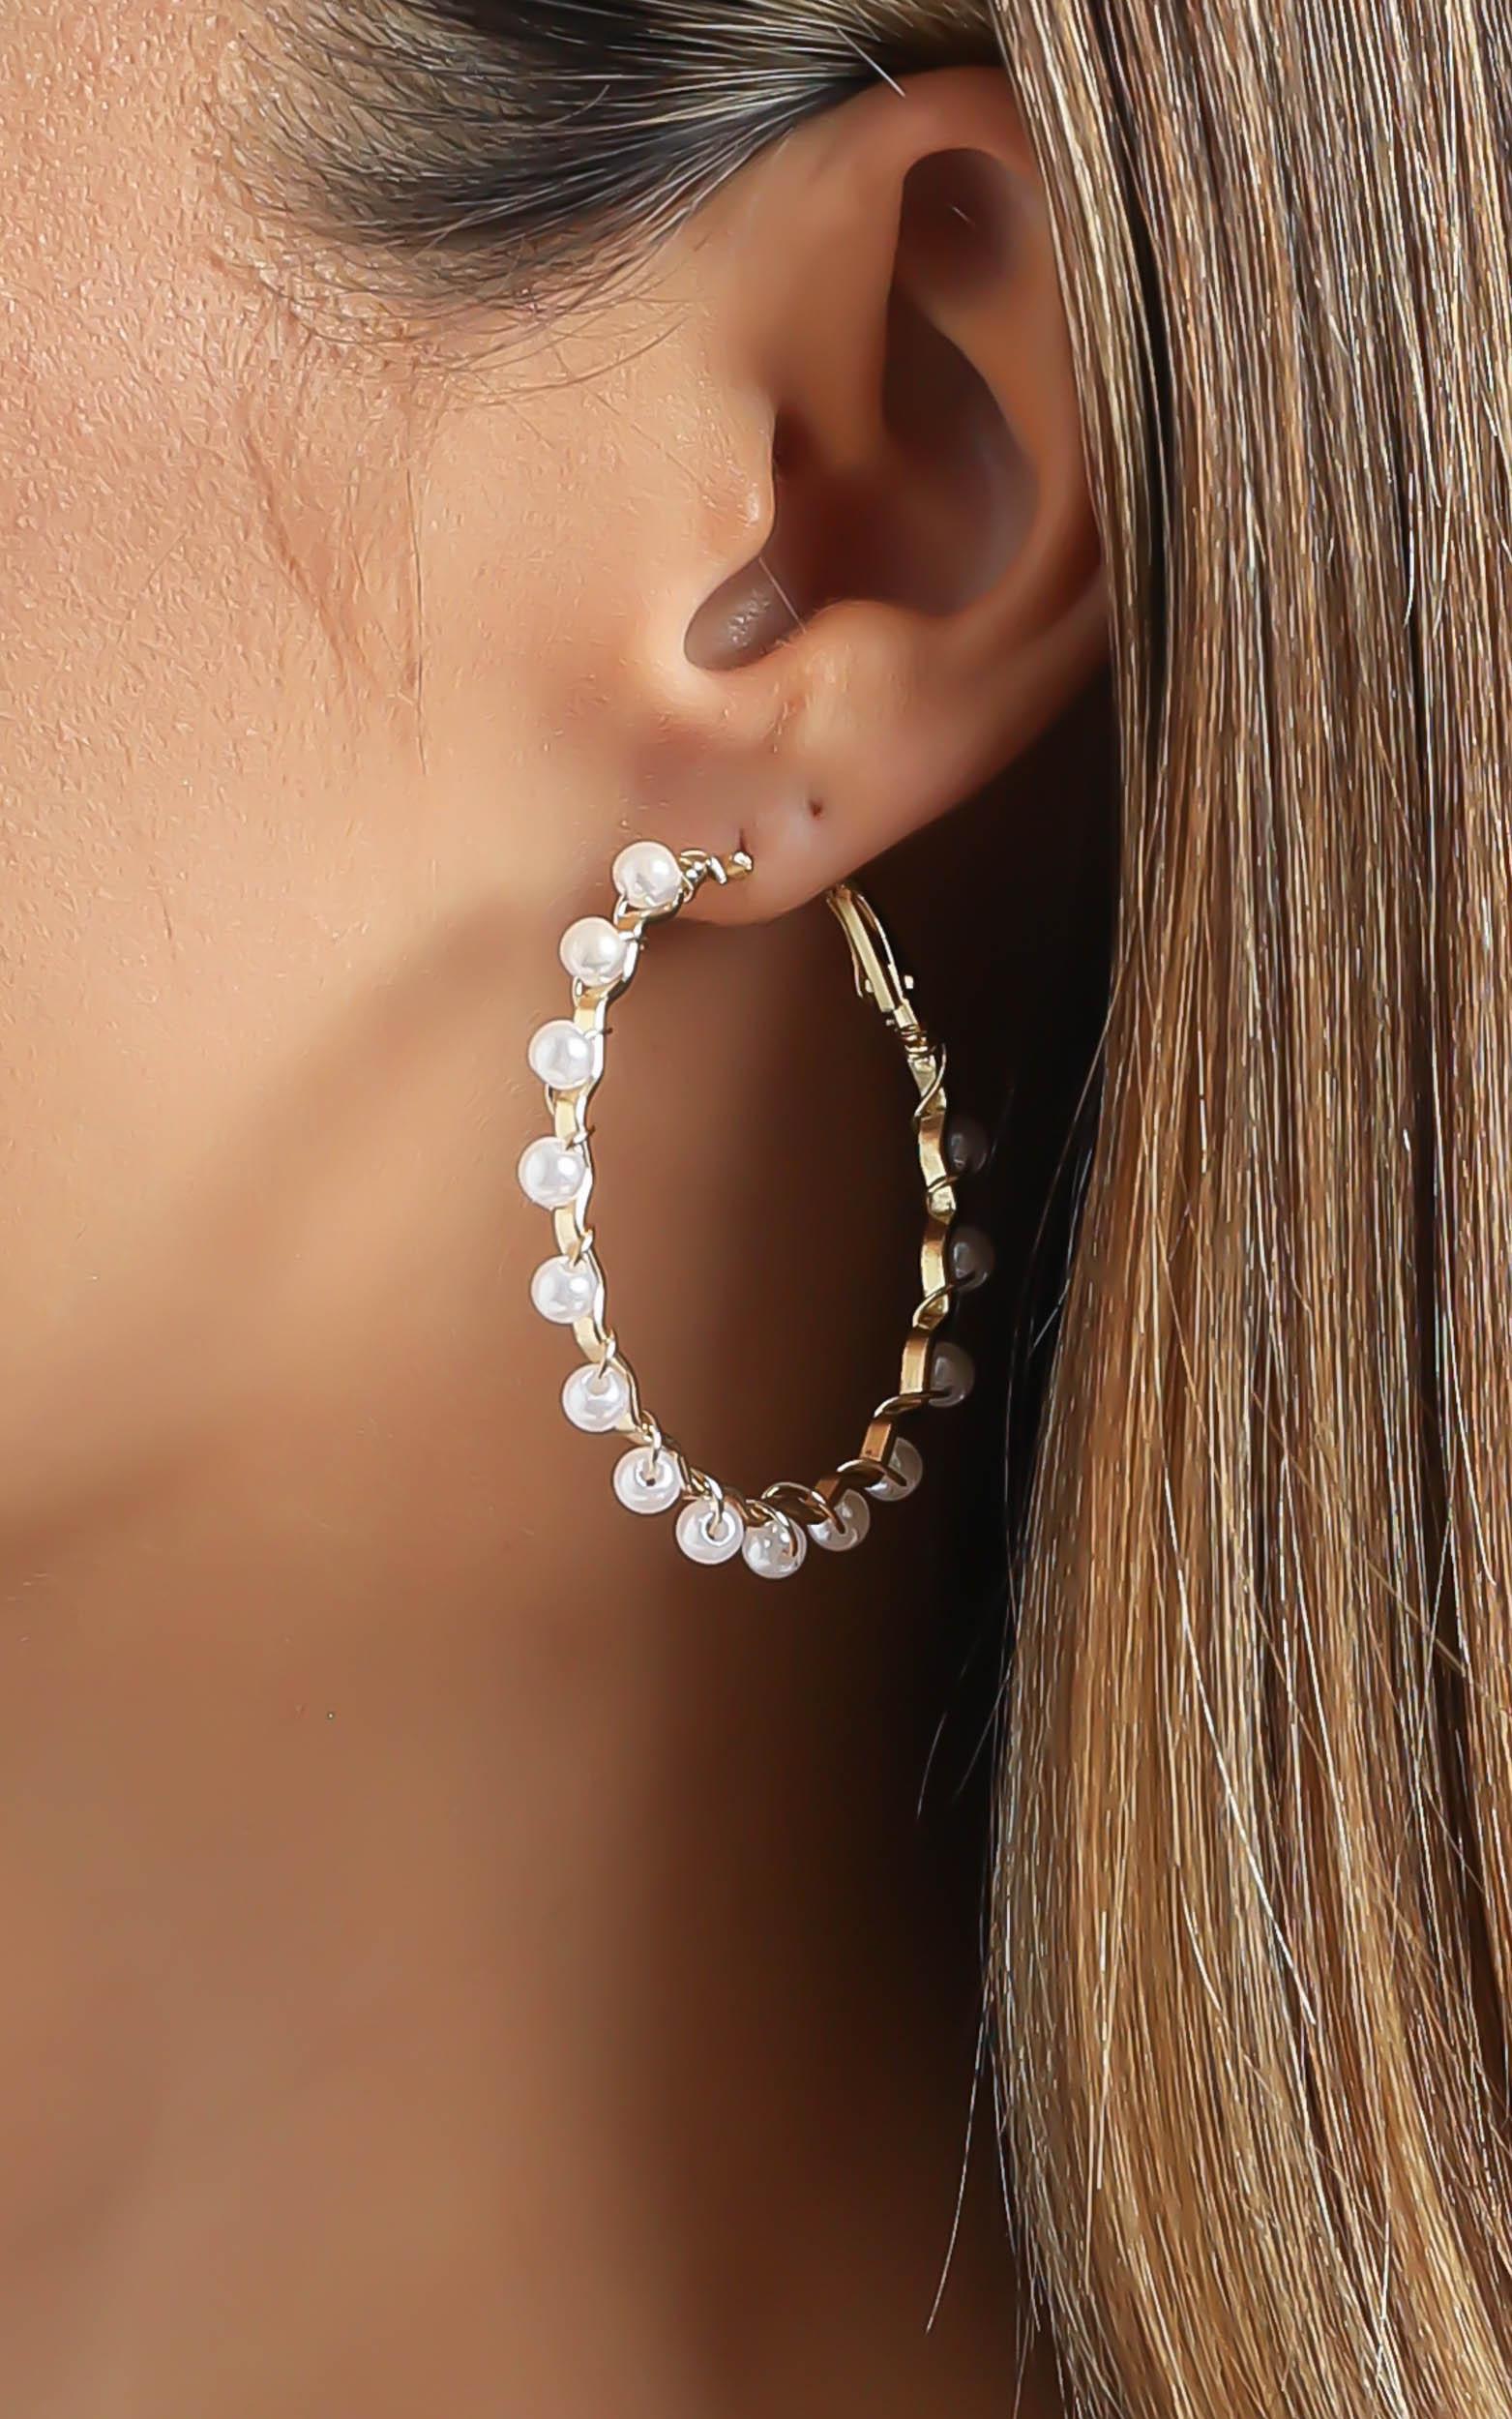 Hoop Earrings with Pearls in Gold, , hi-res image number null